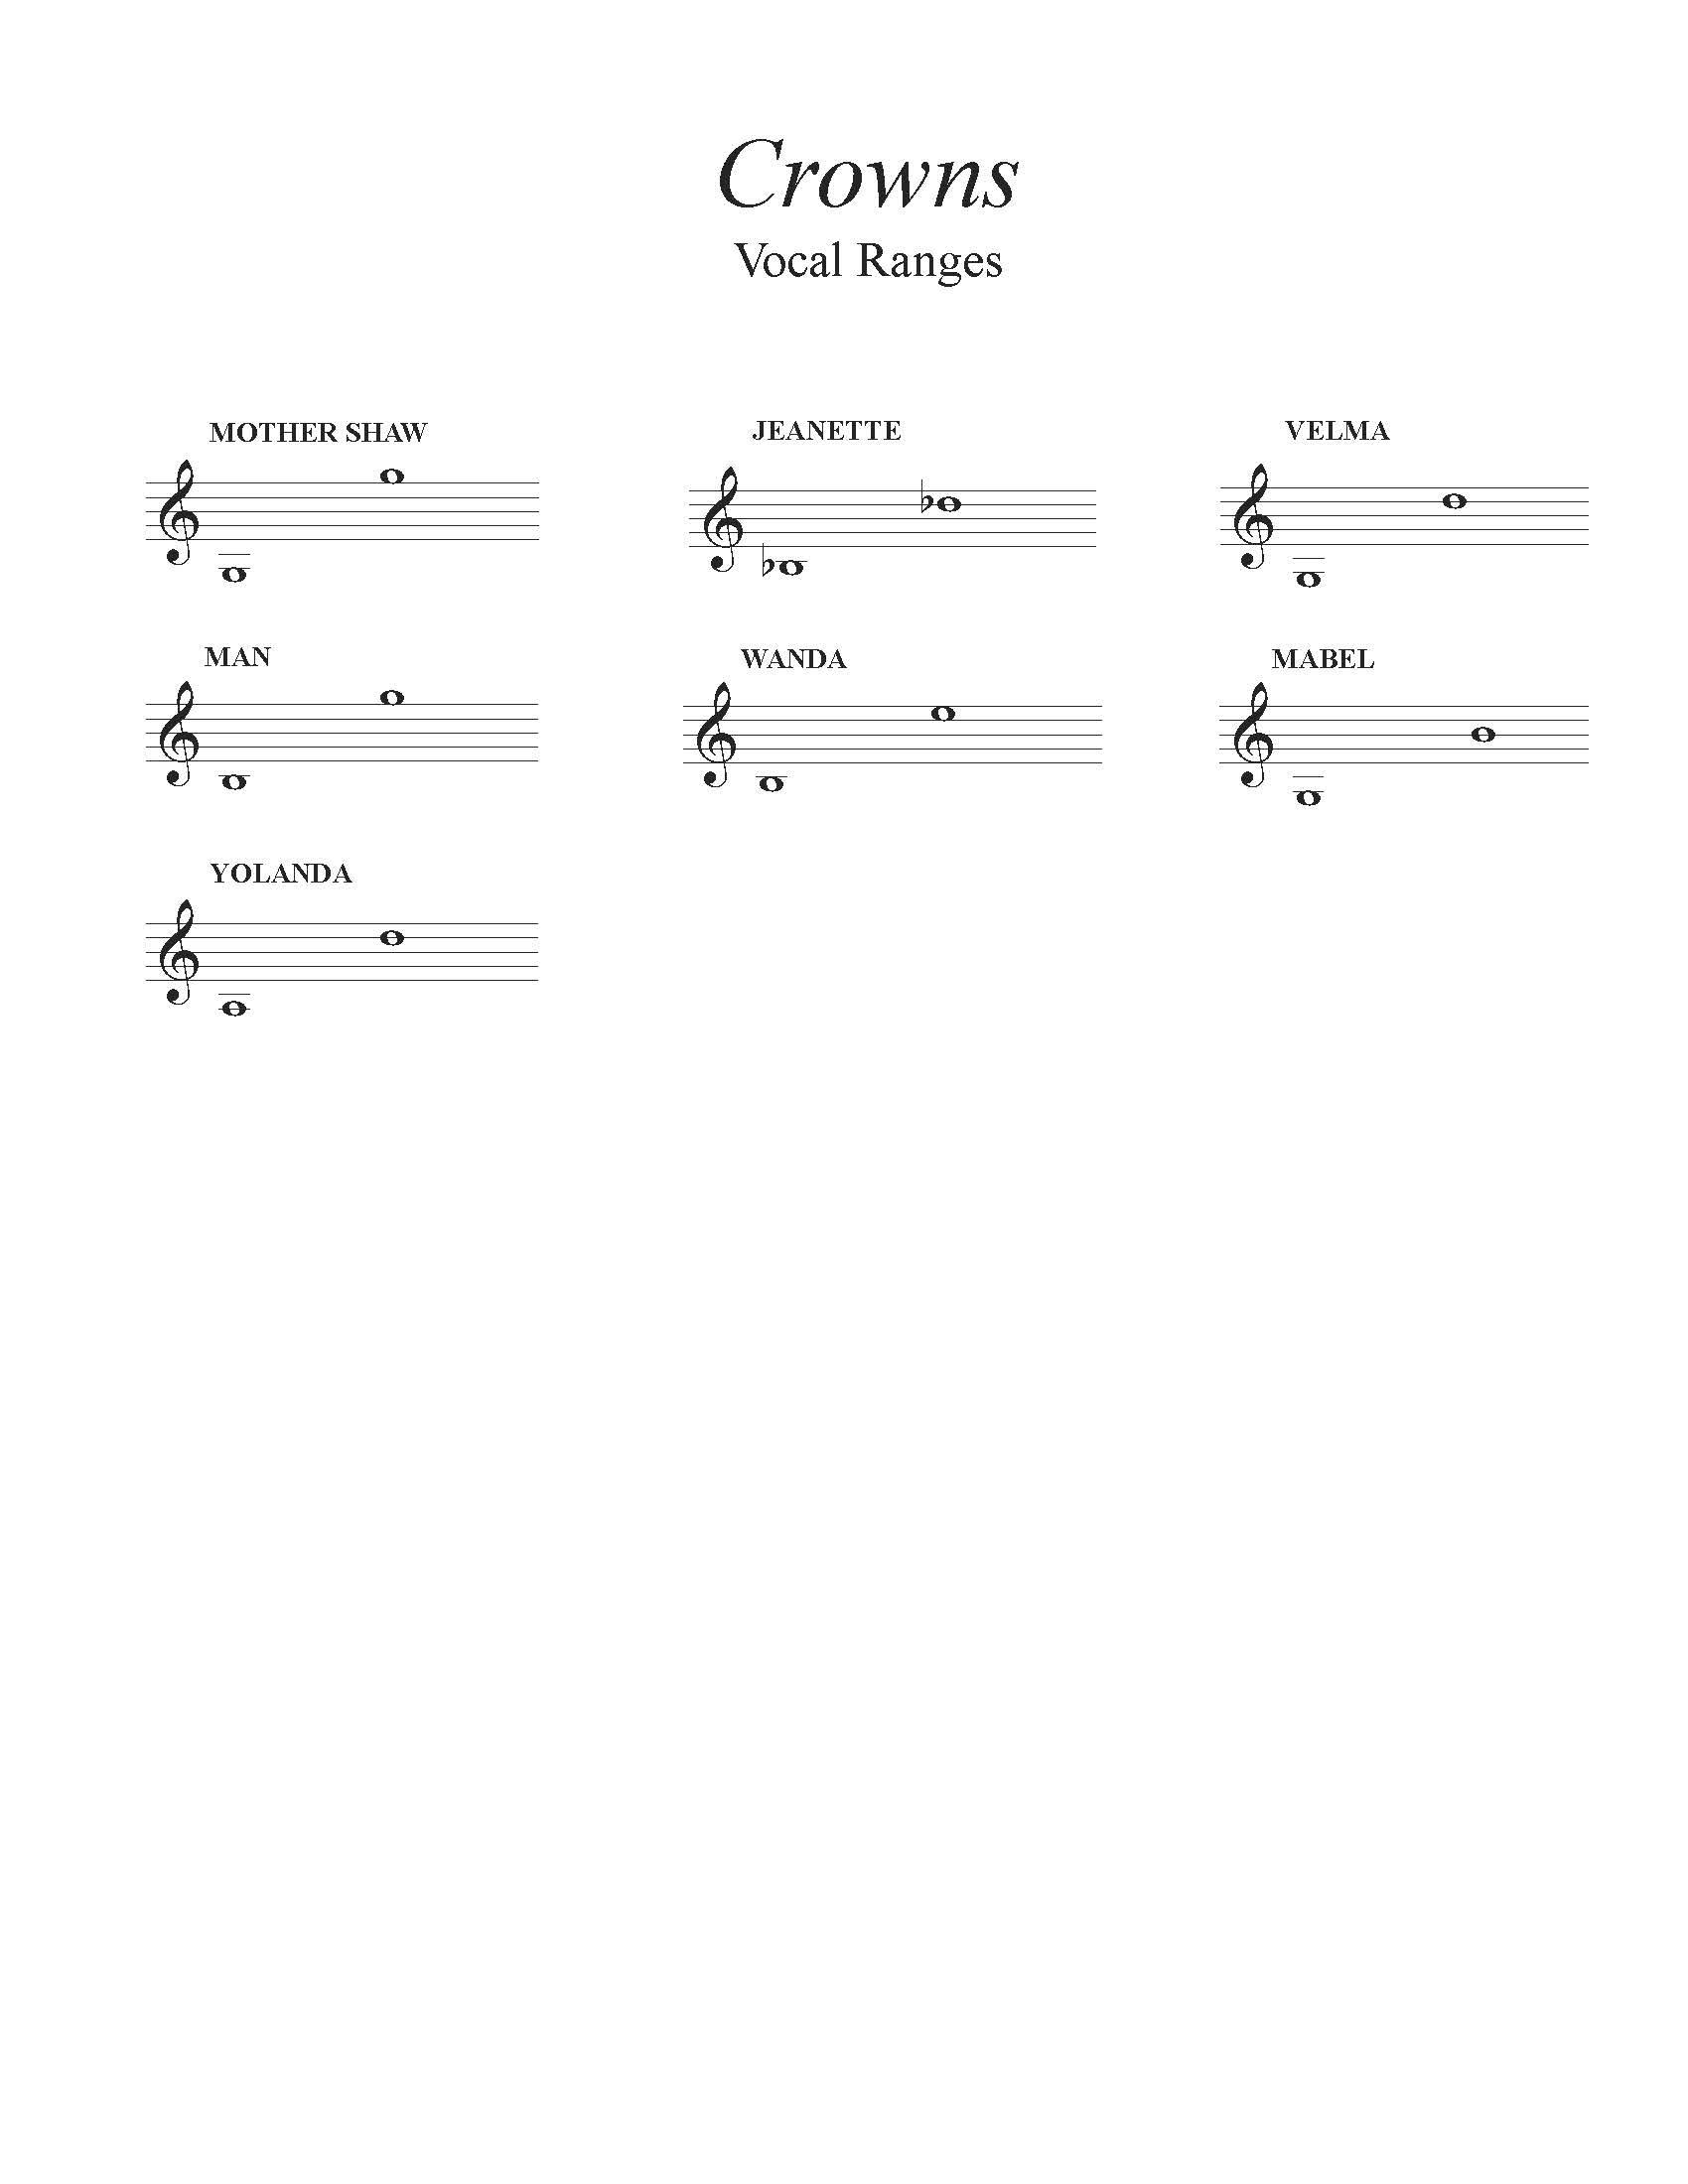 Crowns Vocal Ranges